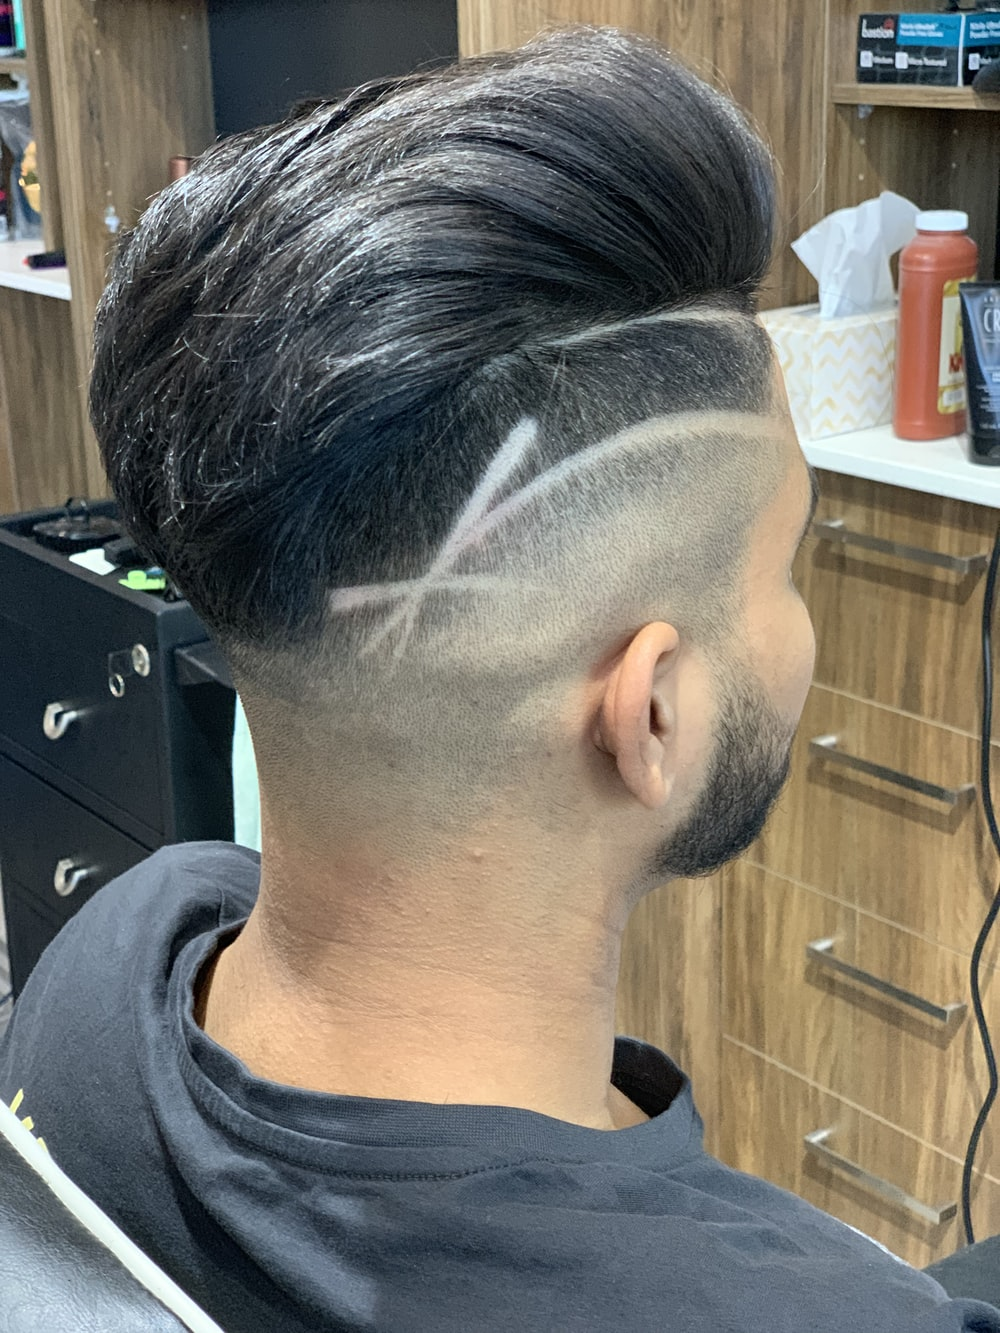 man's head